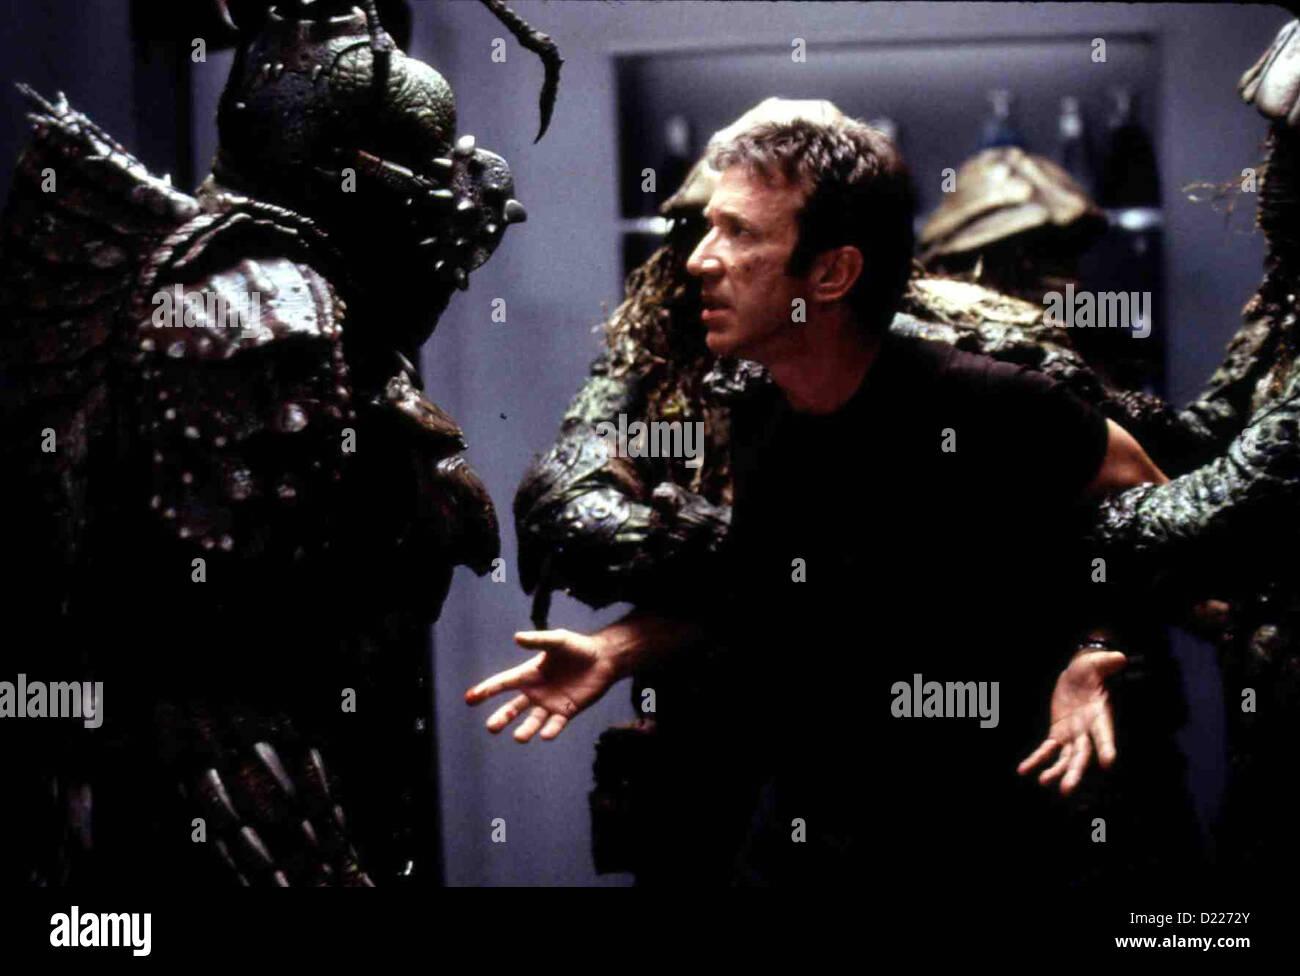 Galaxy Quest - Planlos Durchs Weltall   Galaxy Quest   Tim Allen *** Local Caption *** 1999  DreamWorks - Stock Image